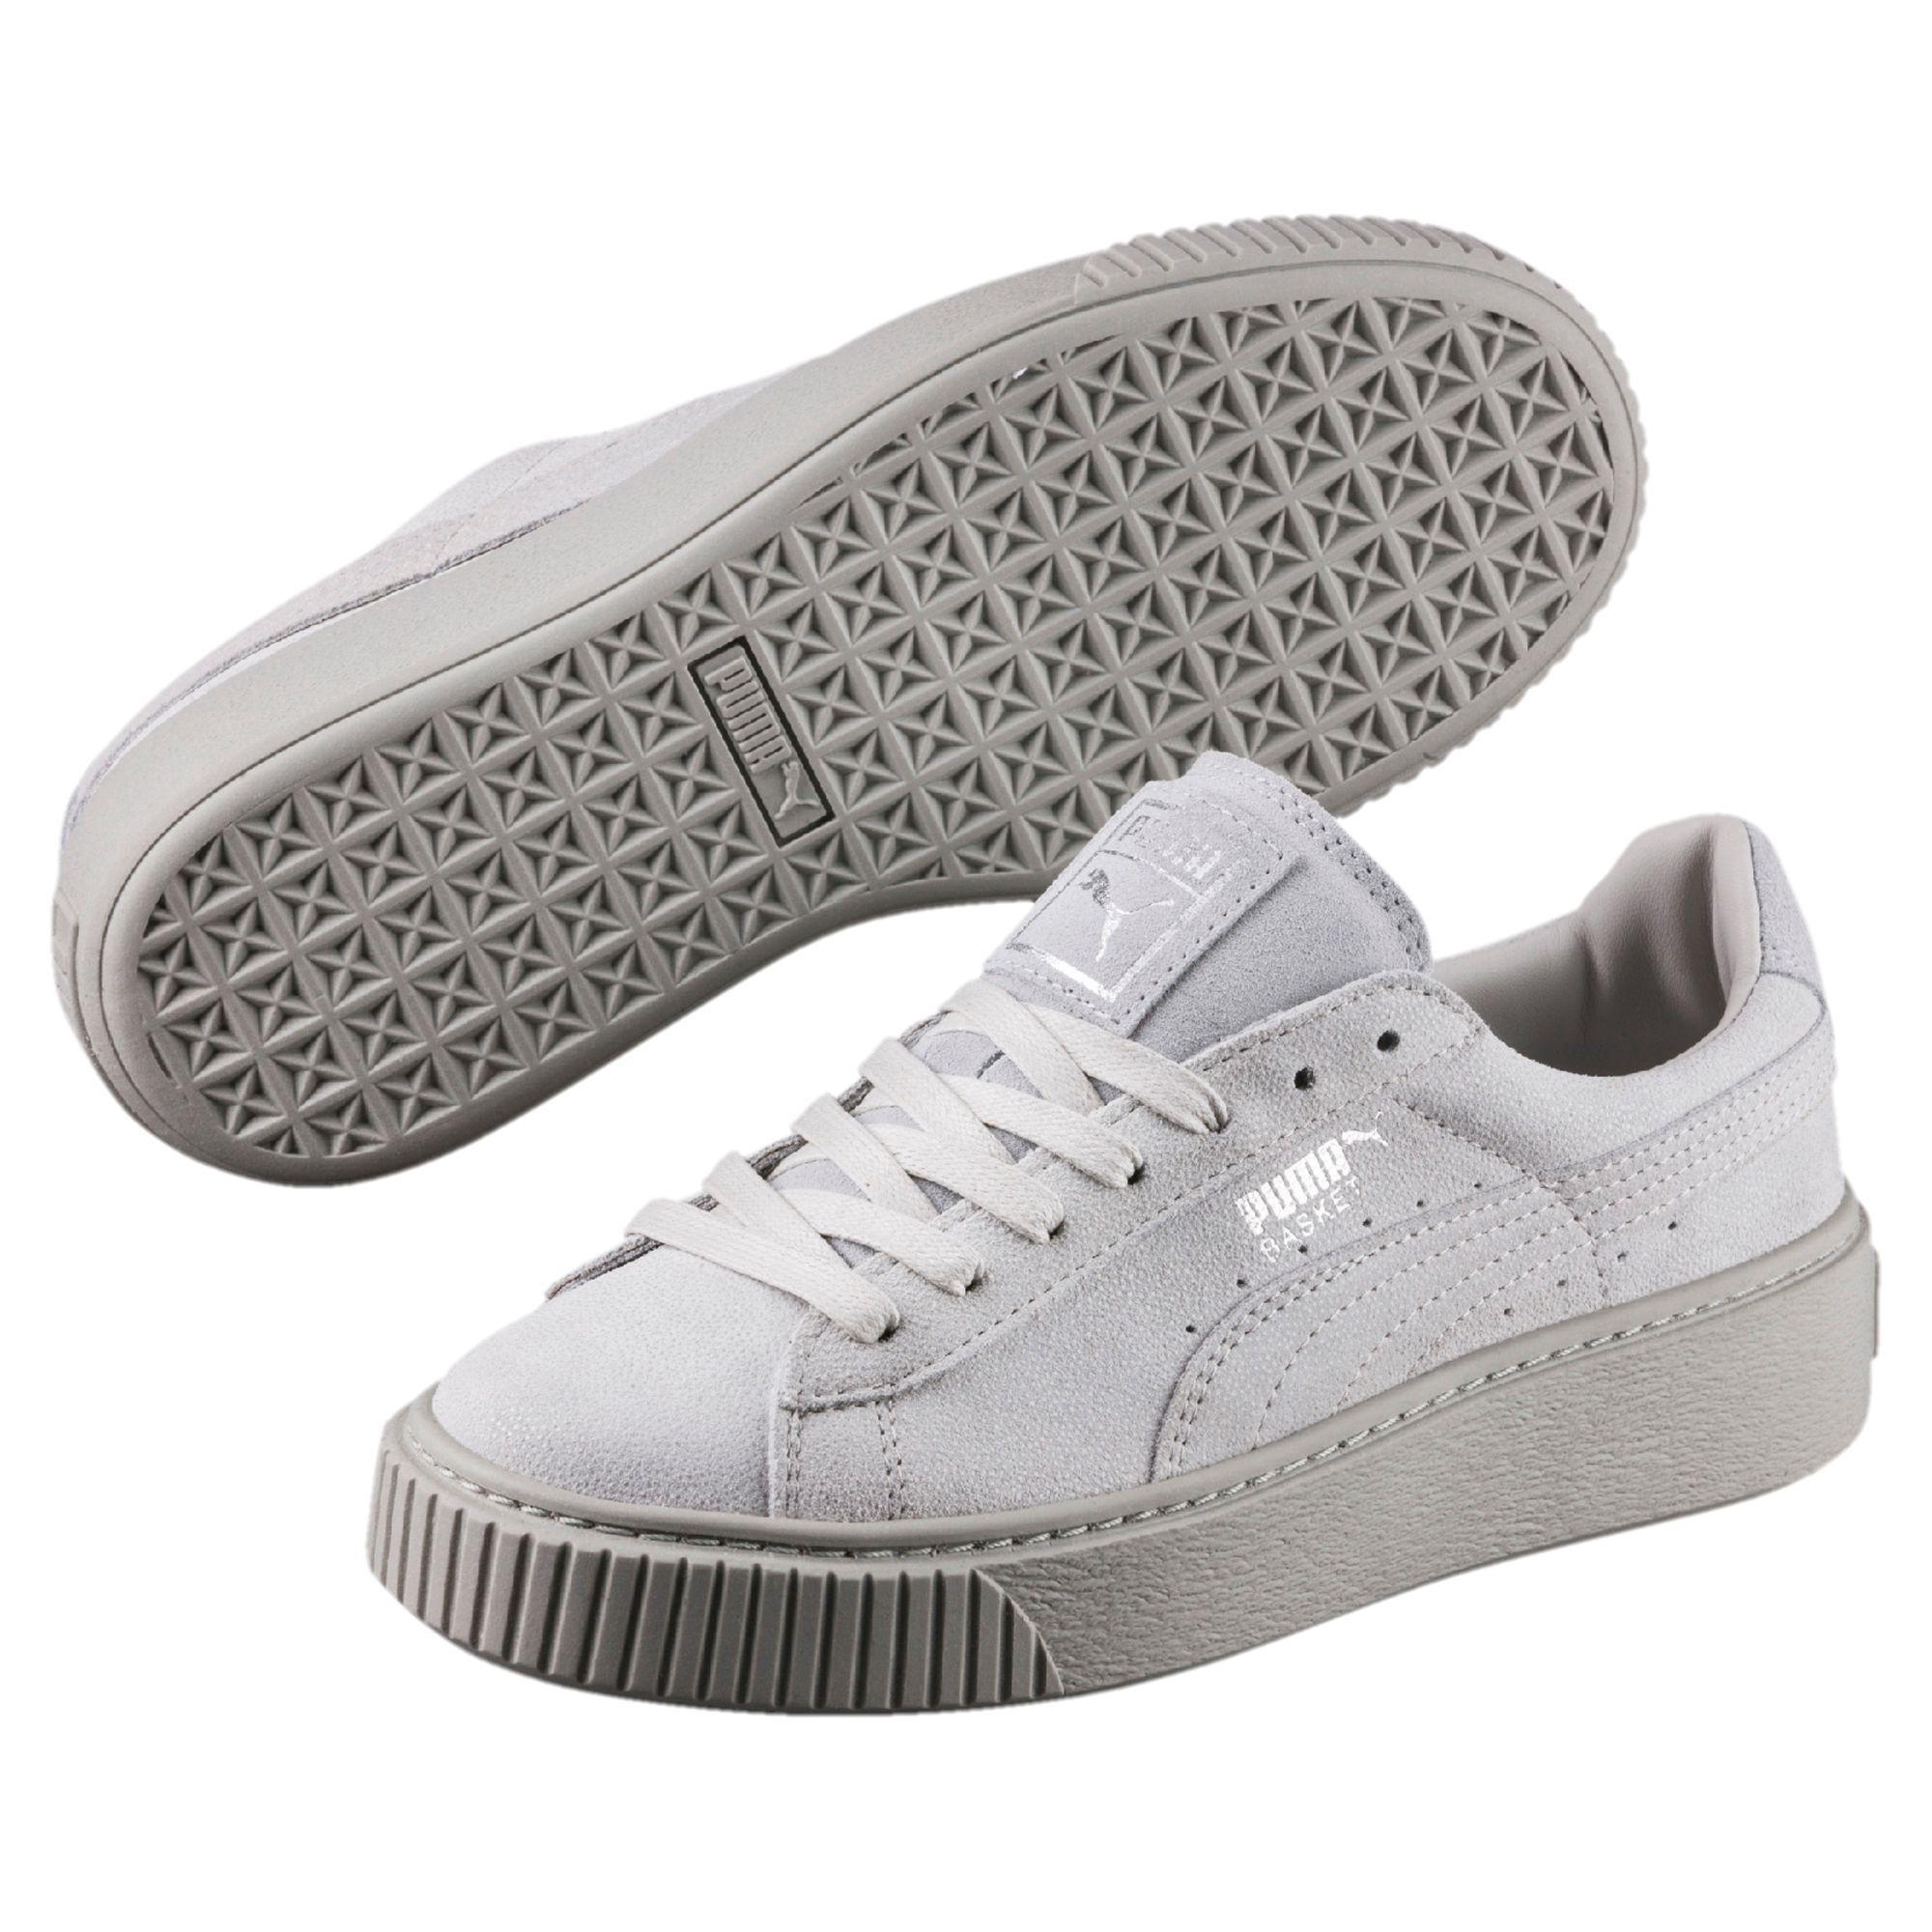 b4f54b6a09c Lyst - PUMA Basket Platform Reset Women s Sneakers in Gray